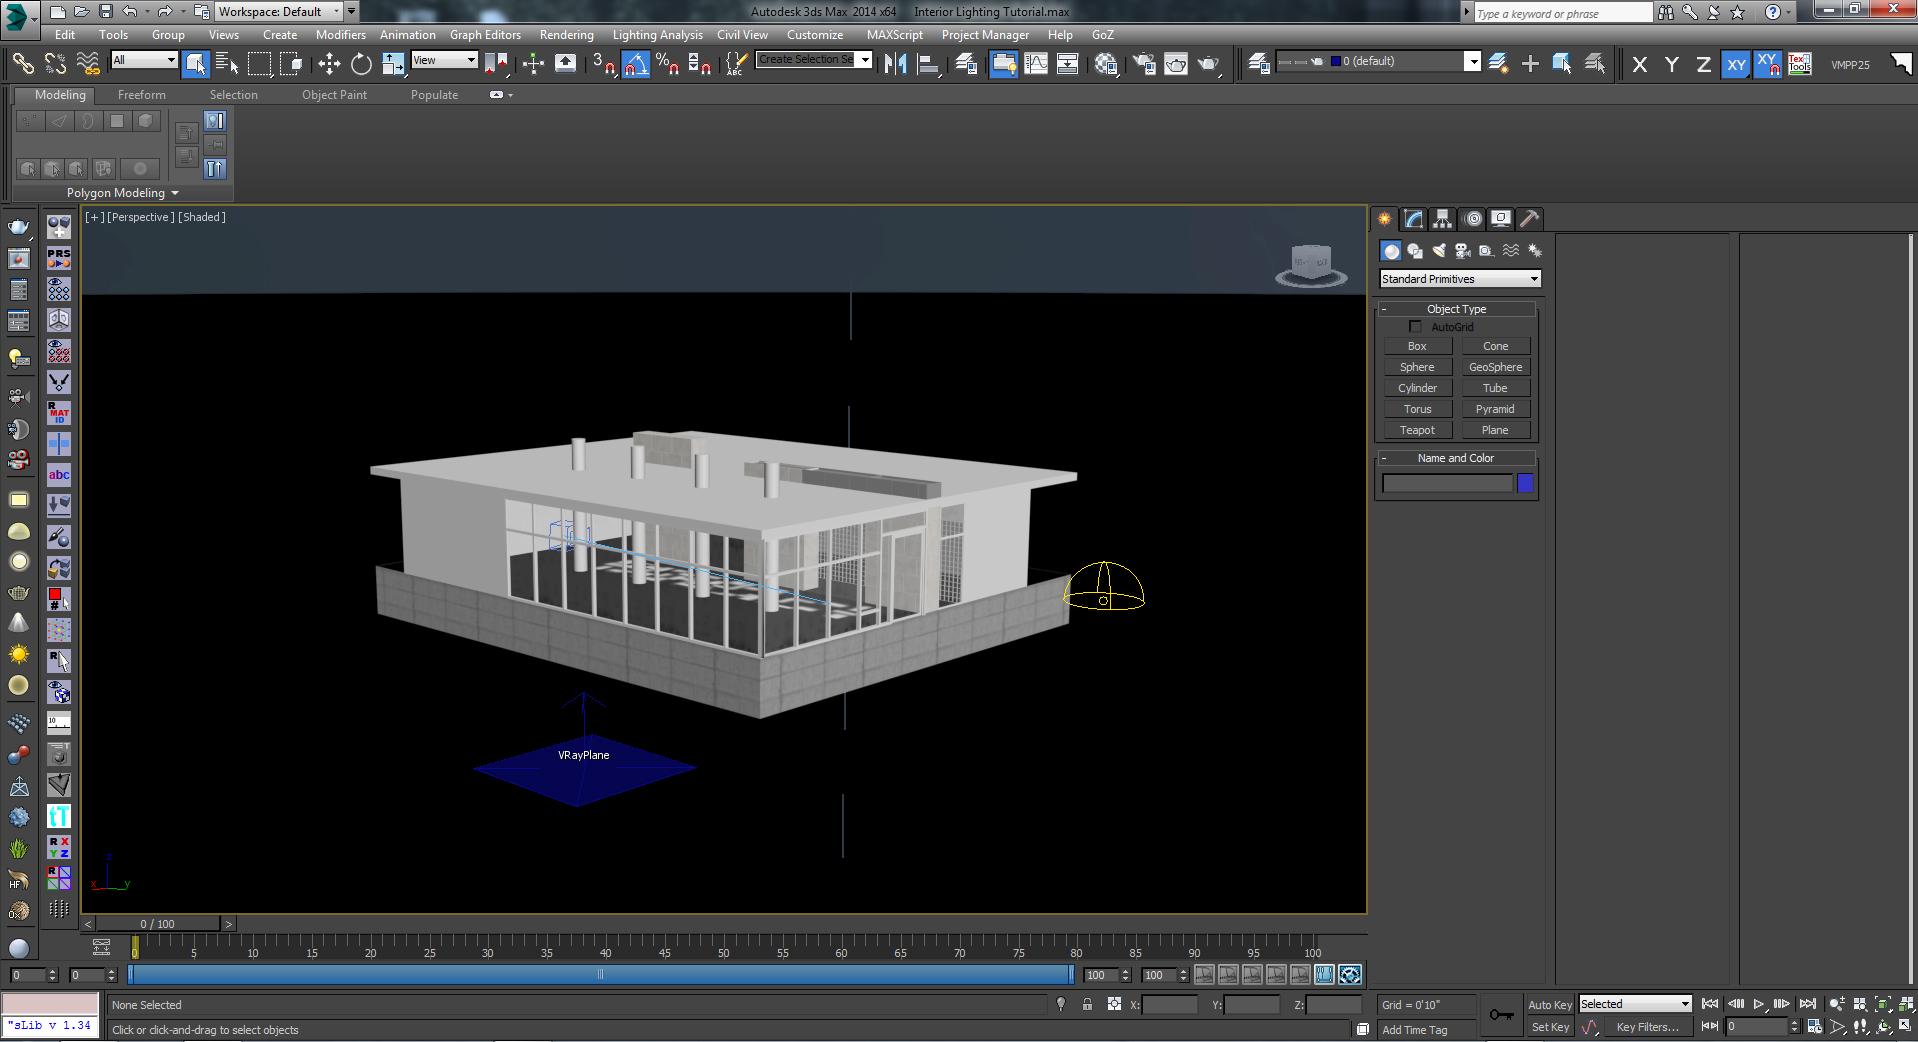 20_Laden-Architektur-innenraum-szene_580